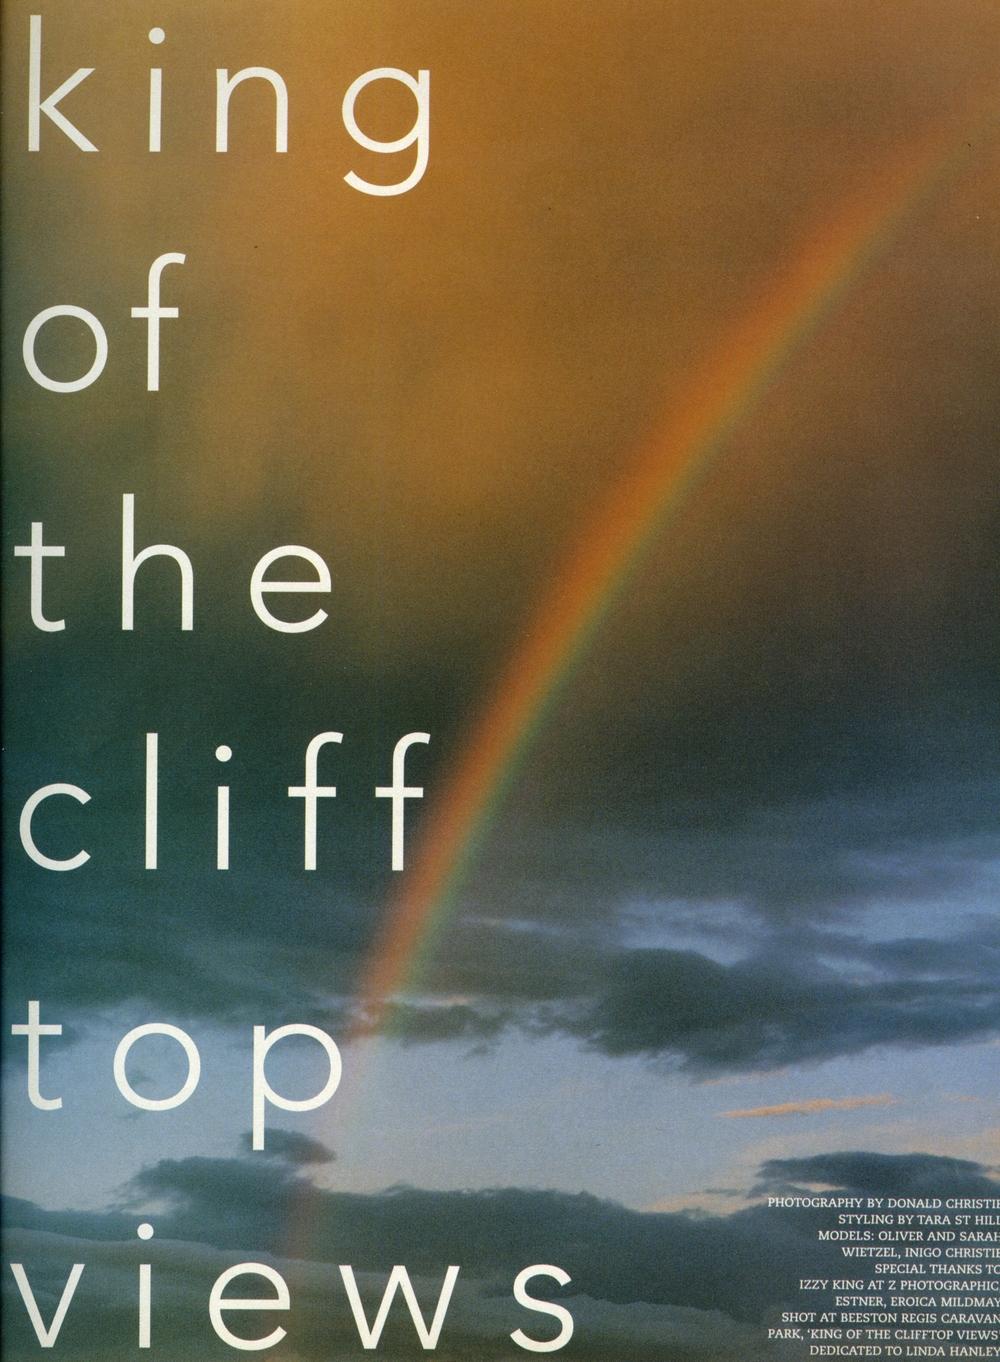 CLIFF001.jpg